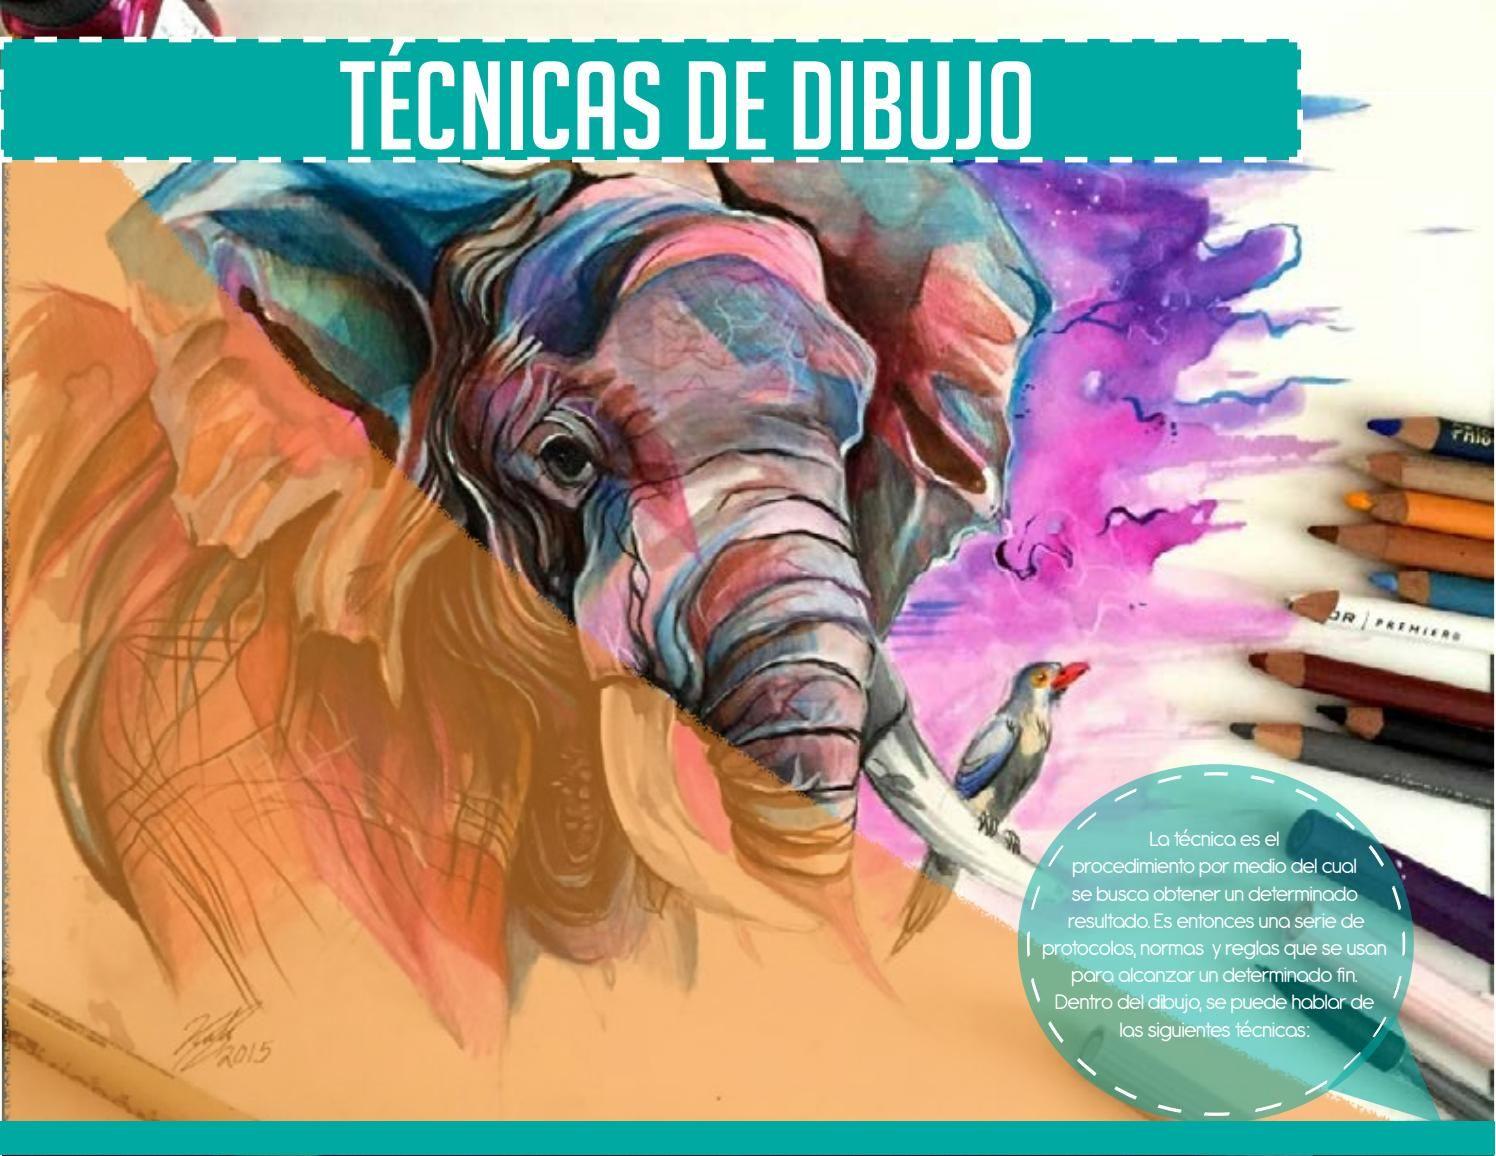 Manual De Tecnicas De Dibujo Para Jovenes Estudiantes De Diseno Grafico Oil Painting Techniques Drawings Painting Techniques